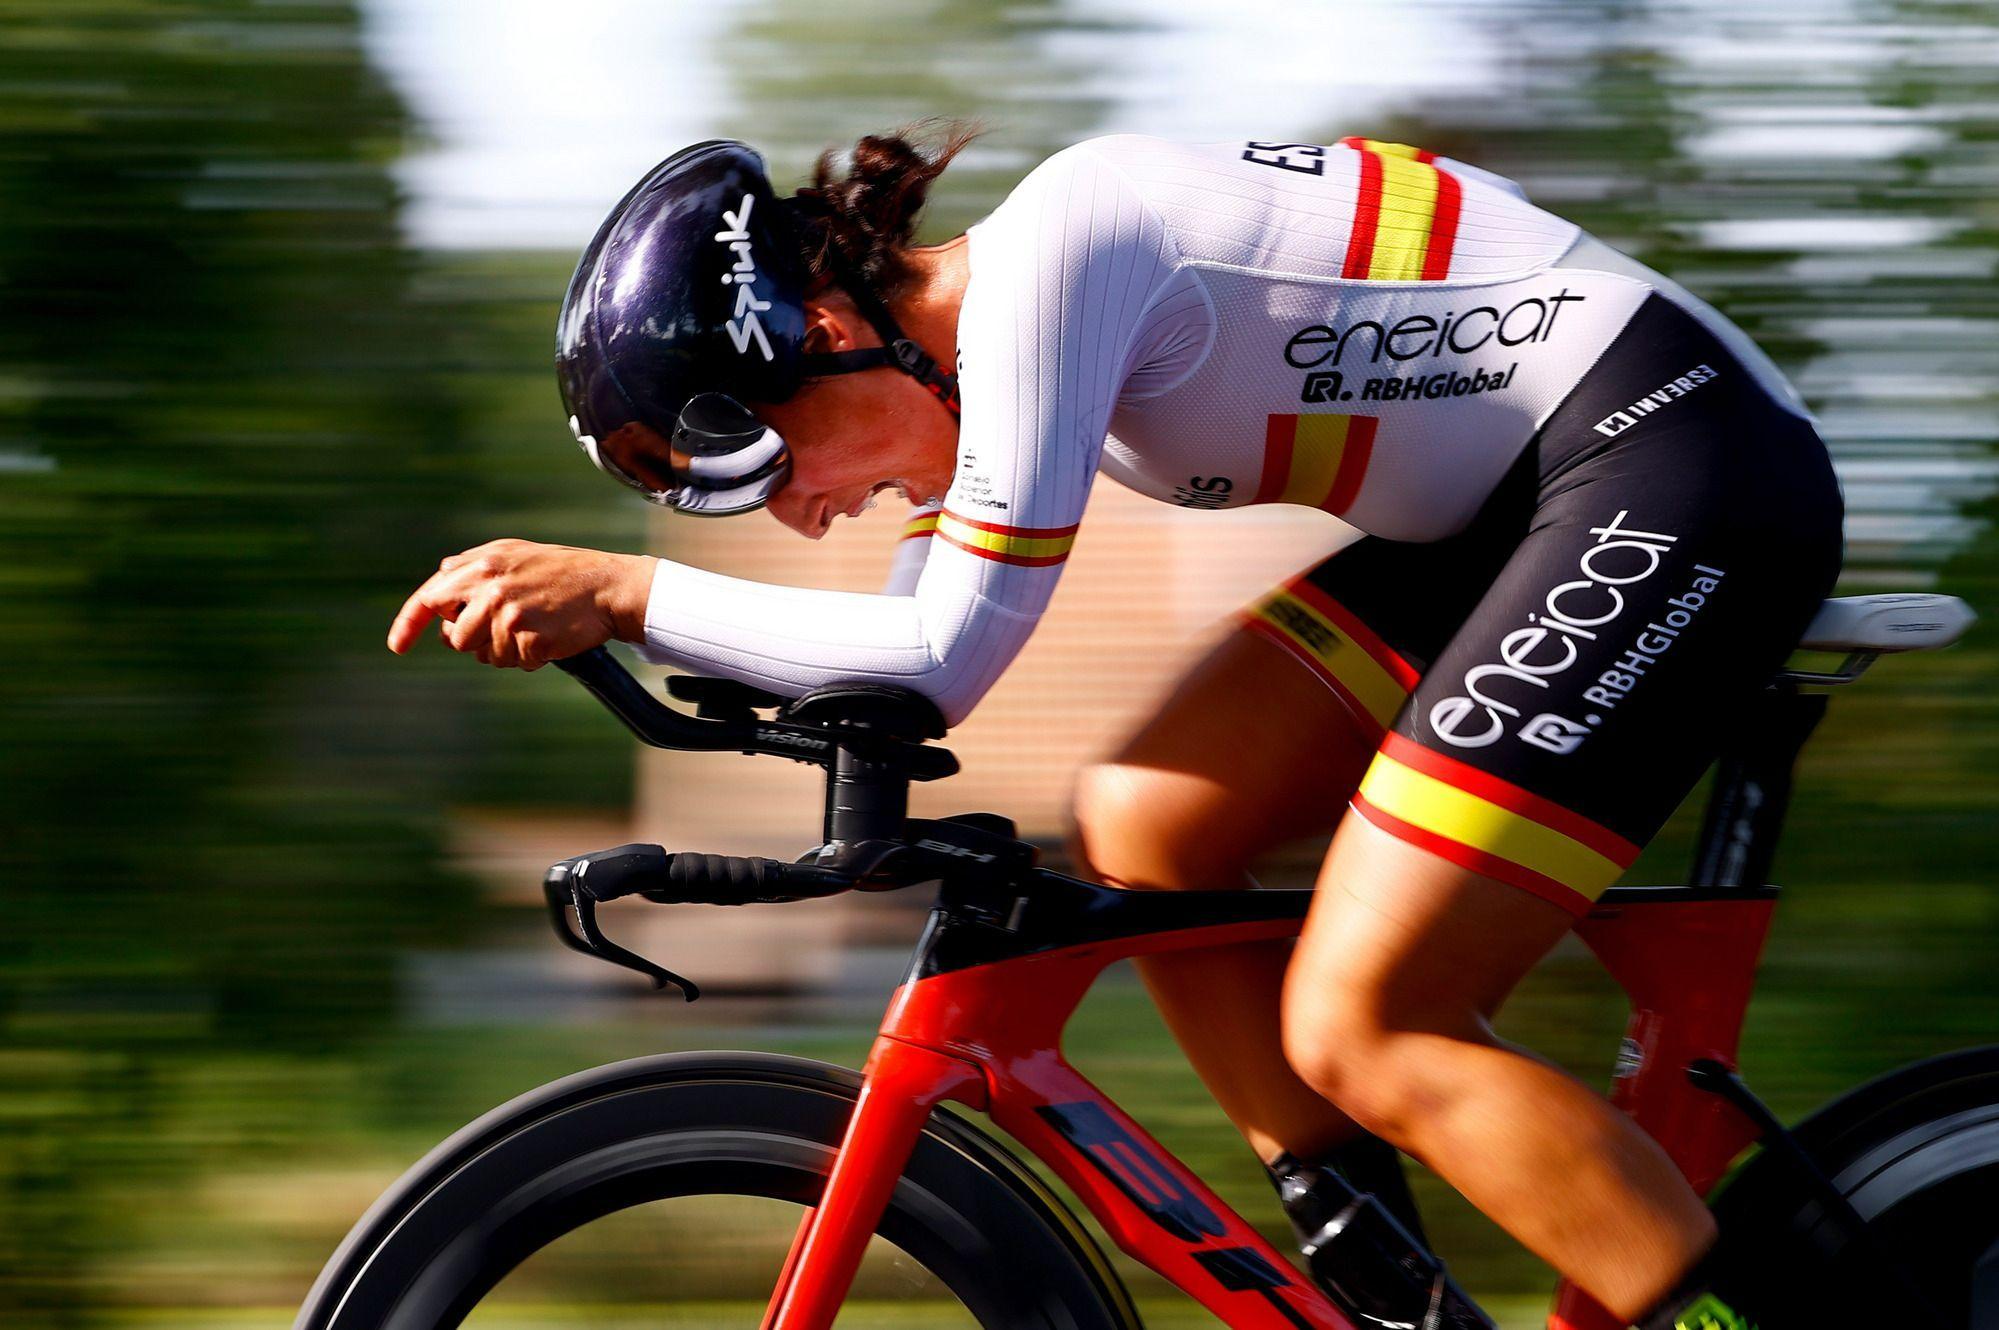 #TeamESPciclismo - Mundial ciclismo en carretera Flandes 2021 -  Contrarrelojs